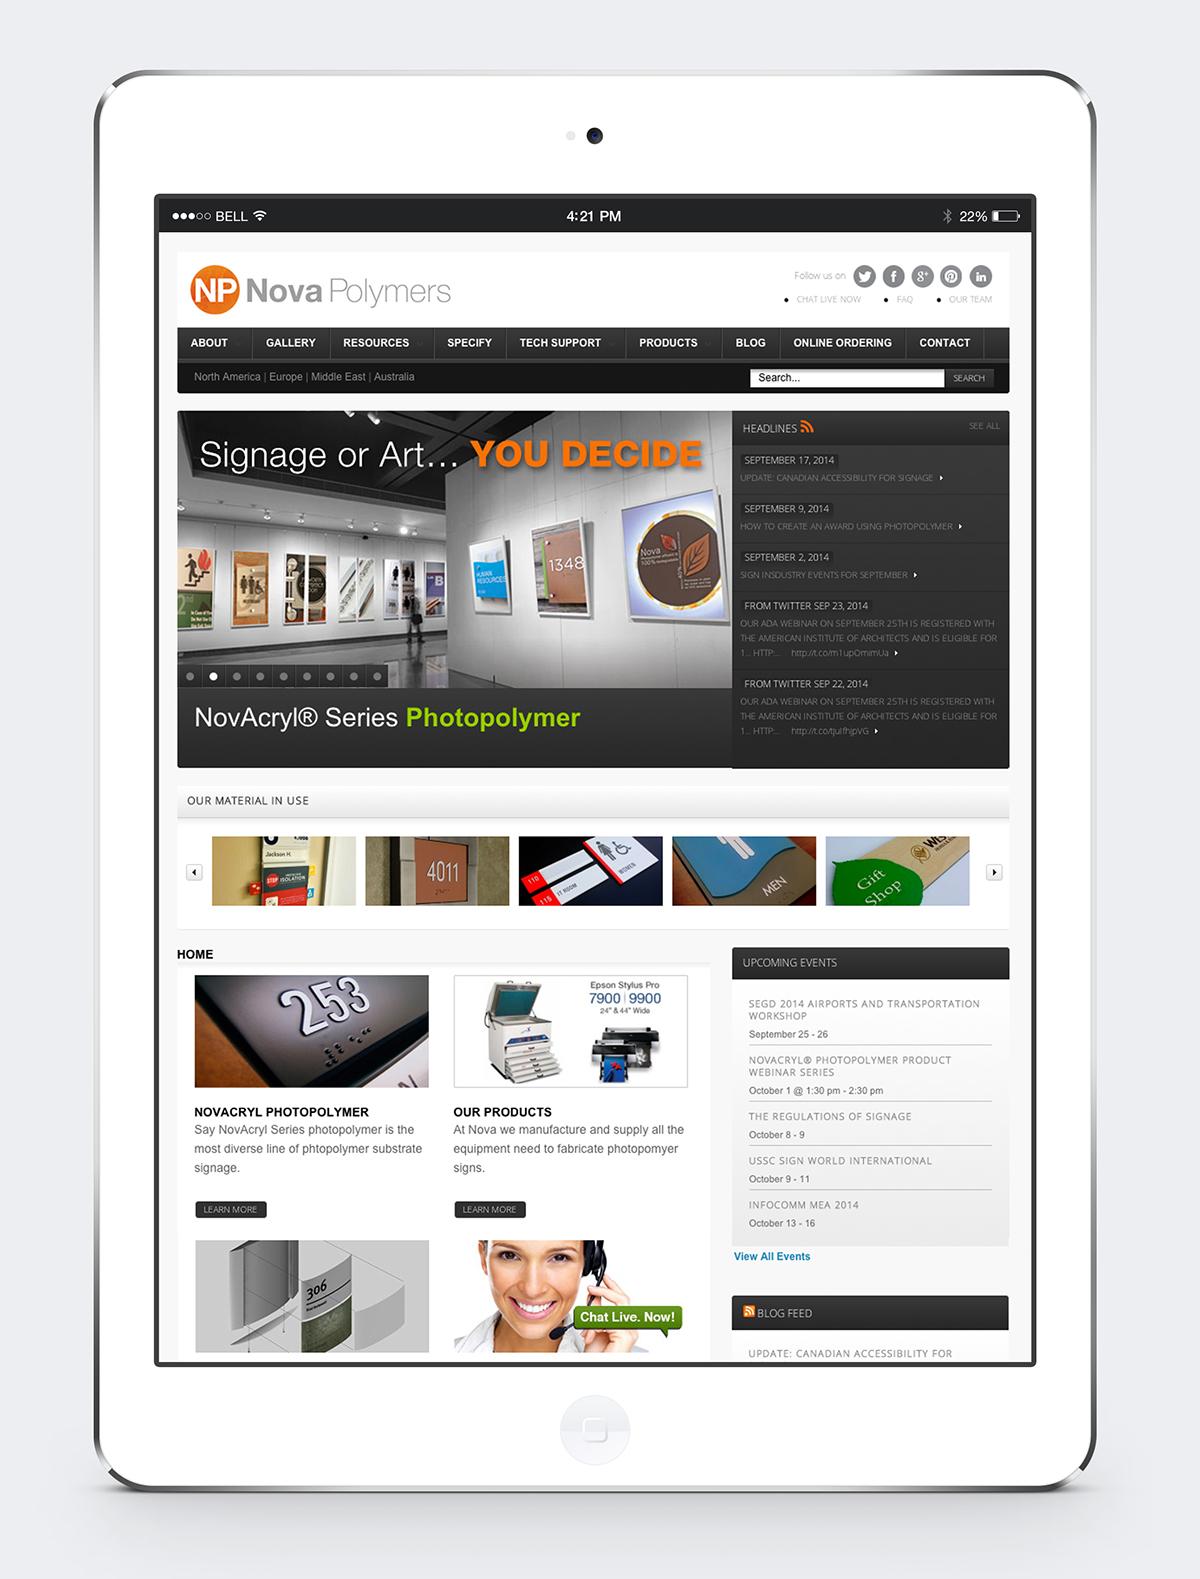 Nova Polymers website redesign and development